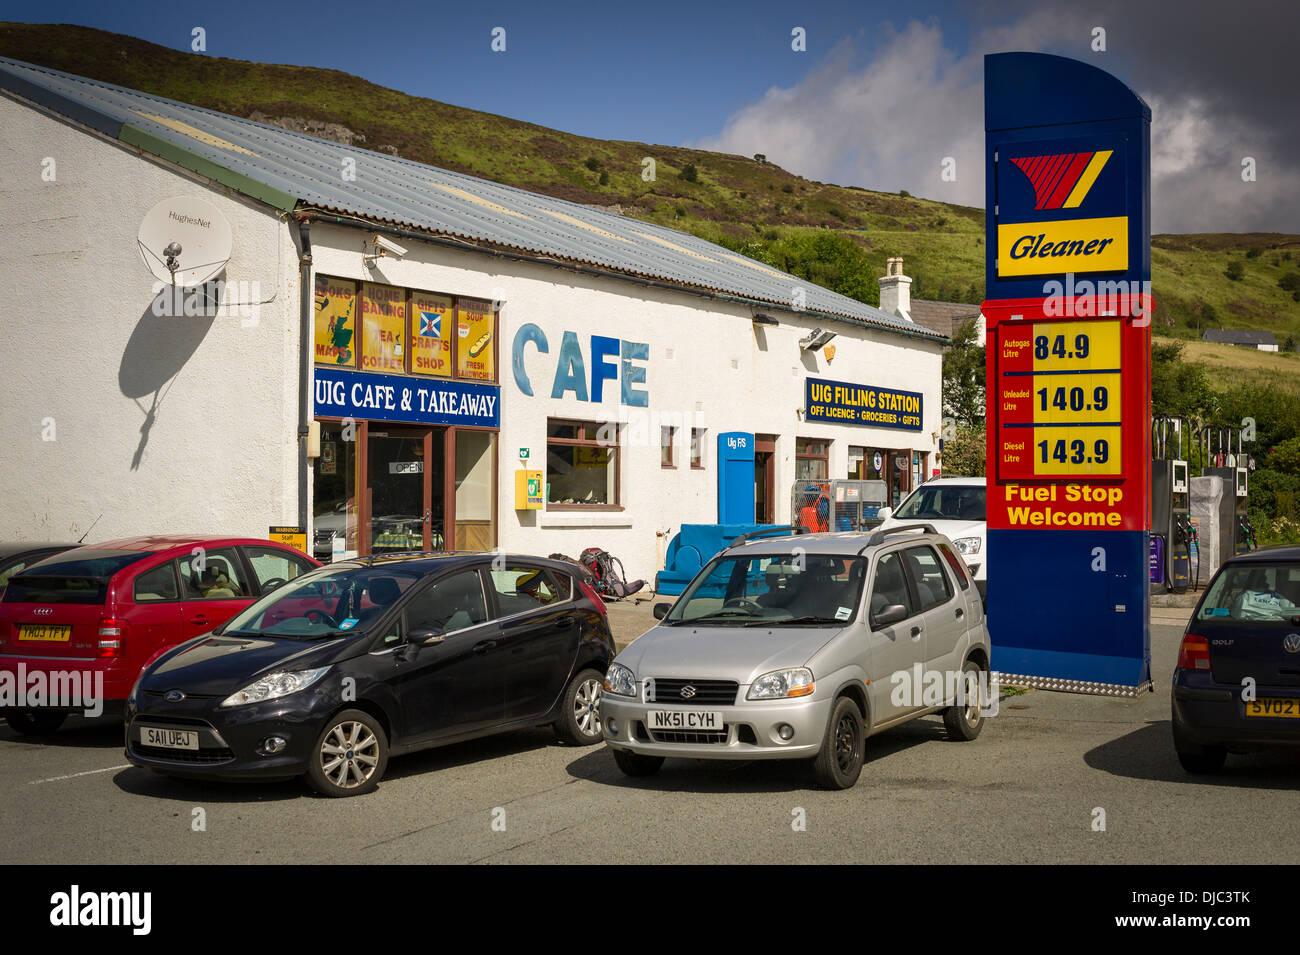 Uig filling station cafe and garage on Skye UK - Stock Image